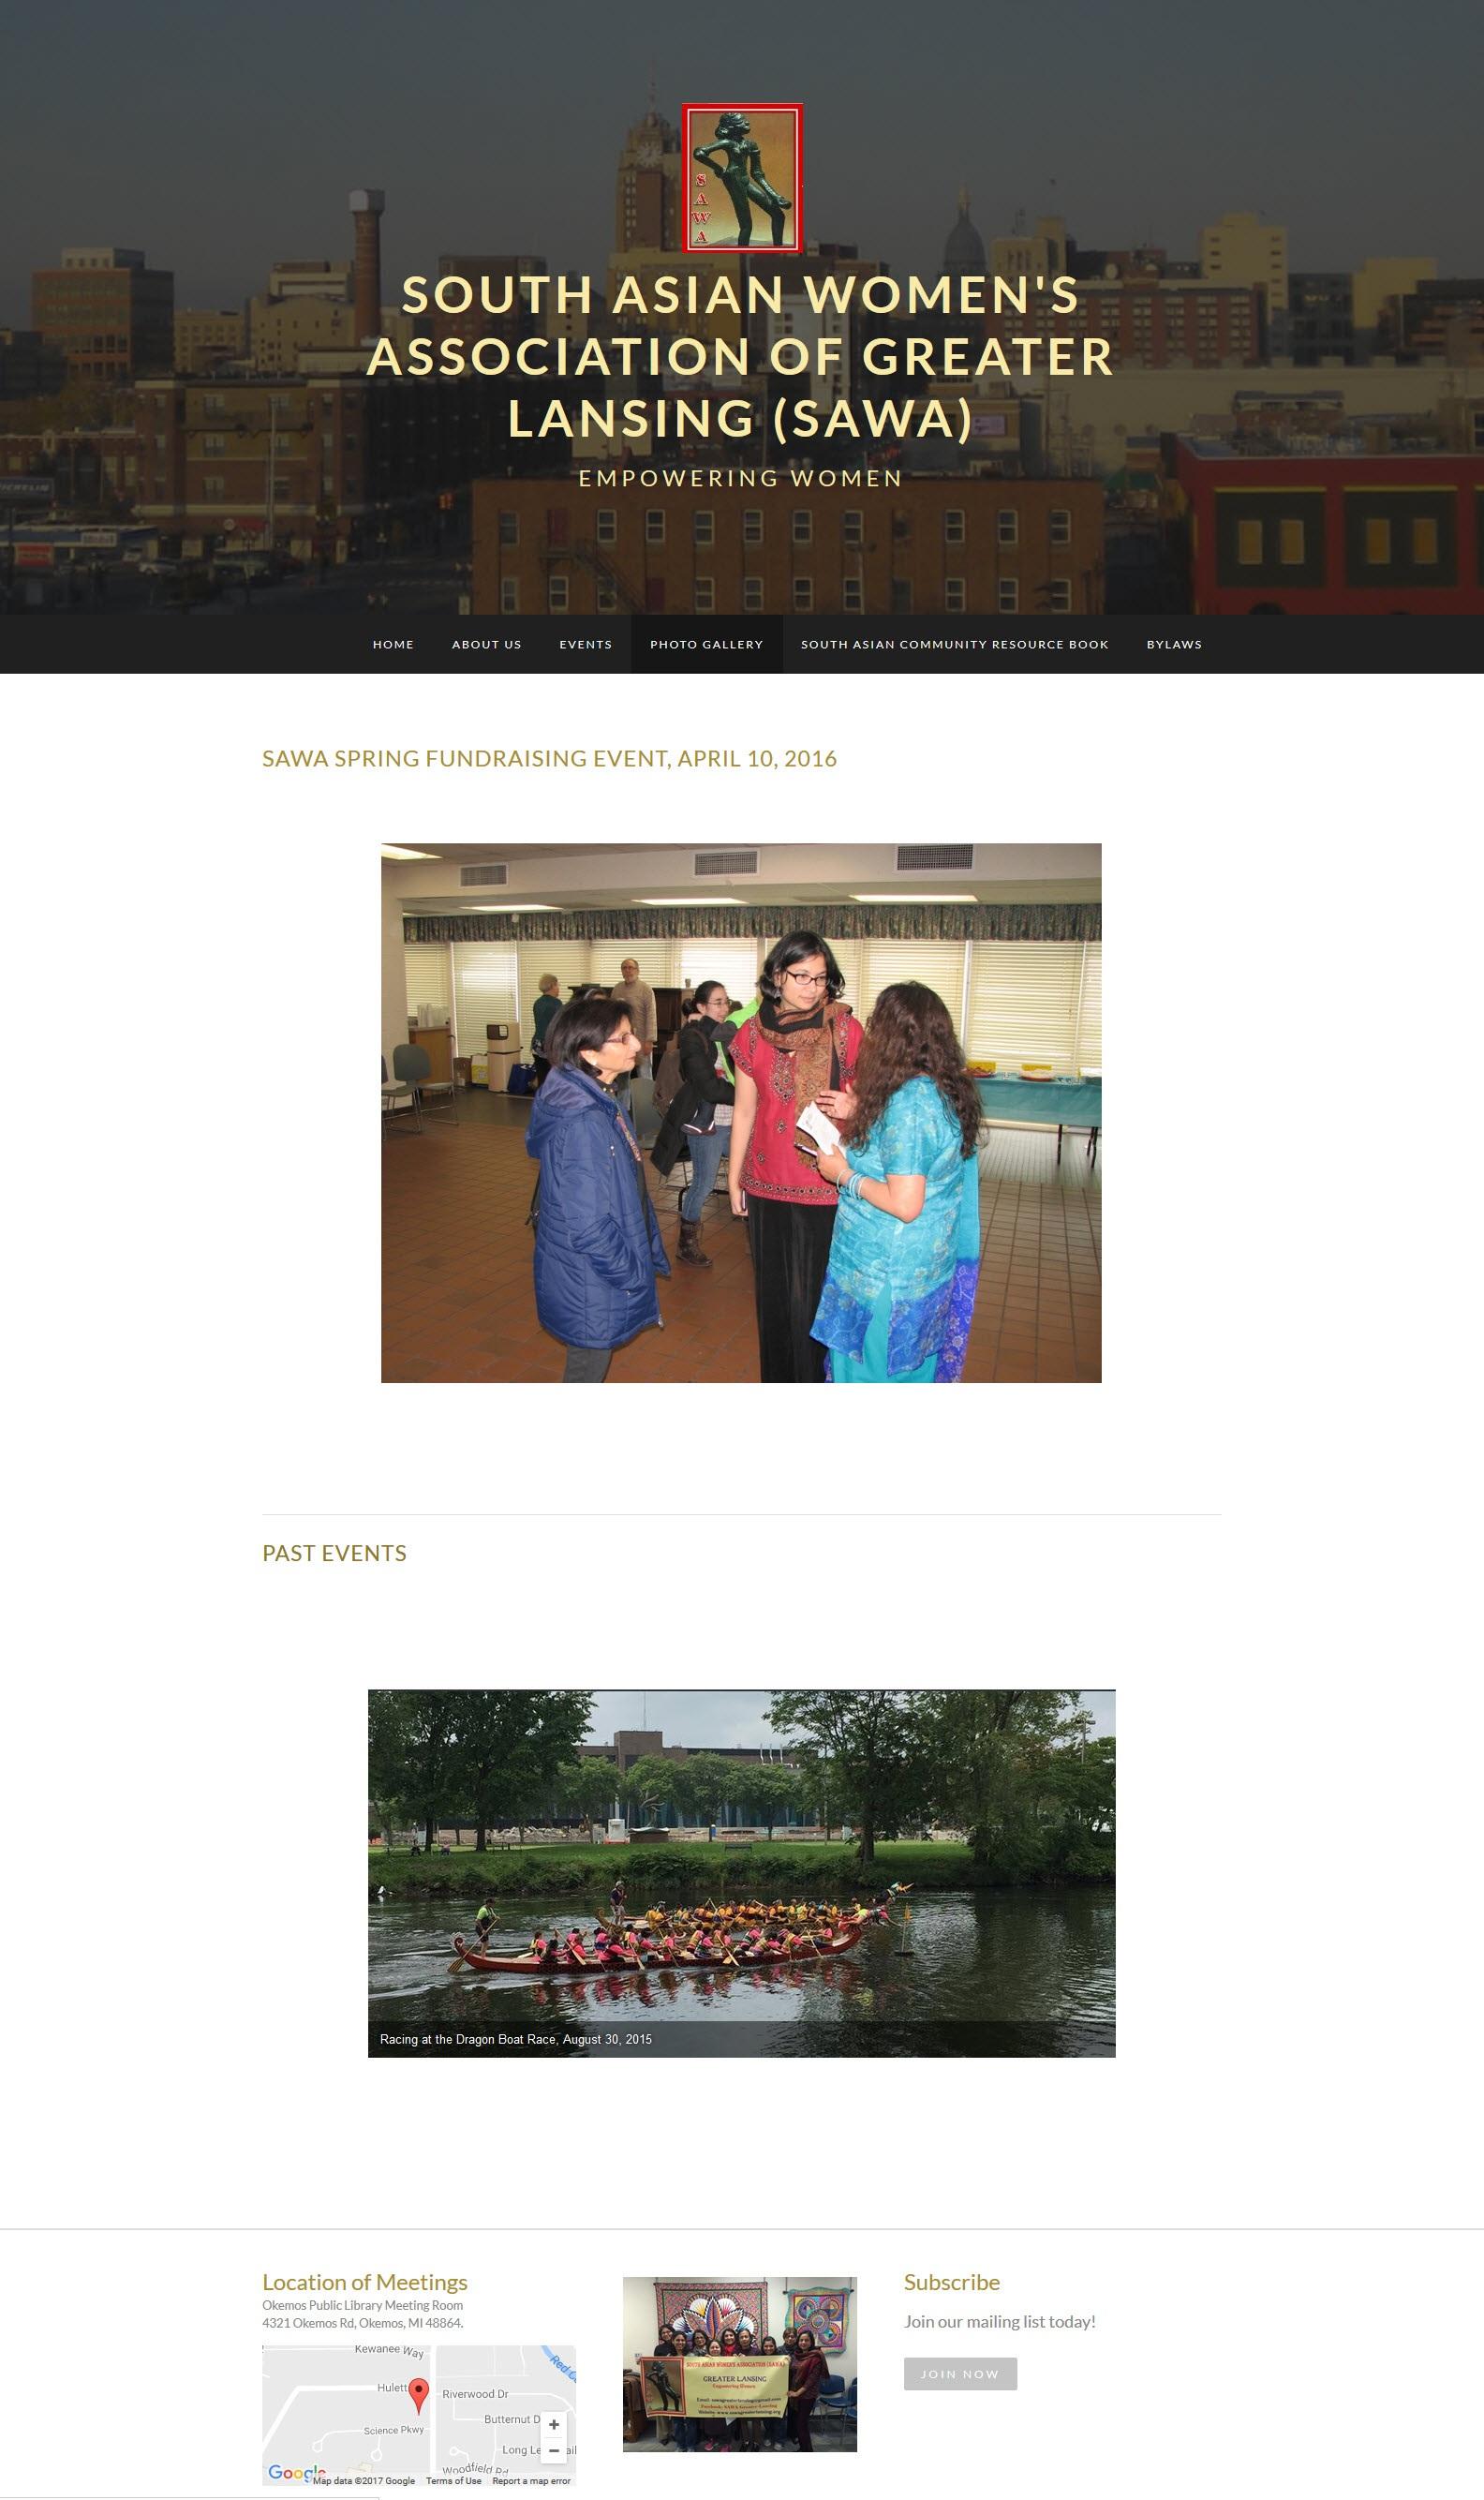 photogallerypage.jpg